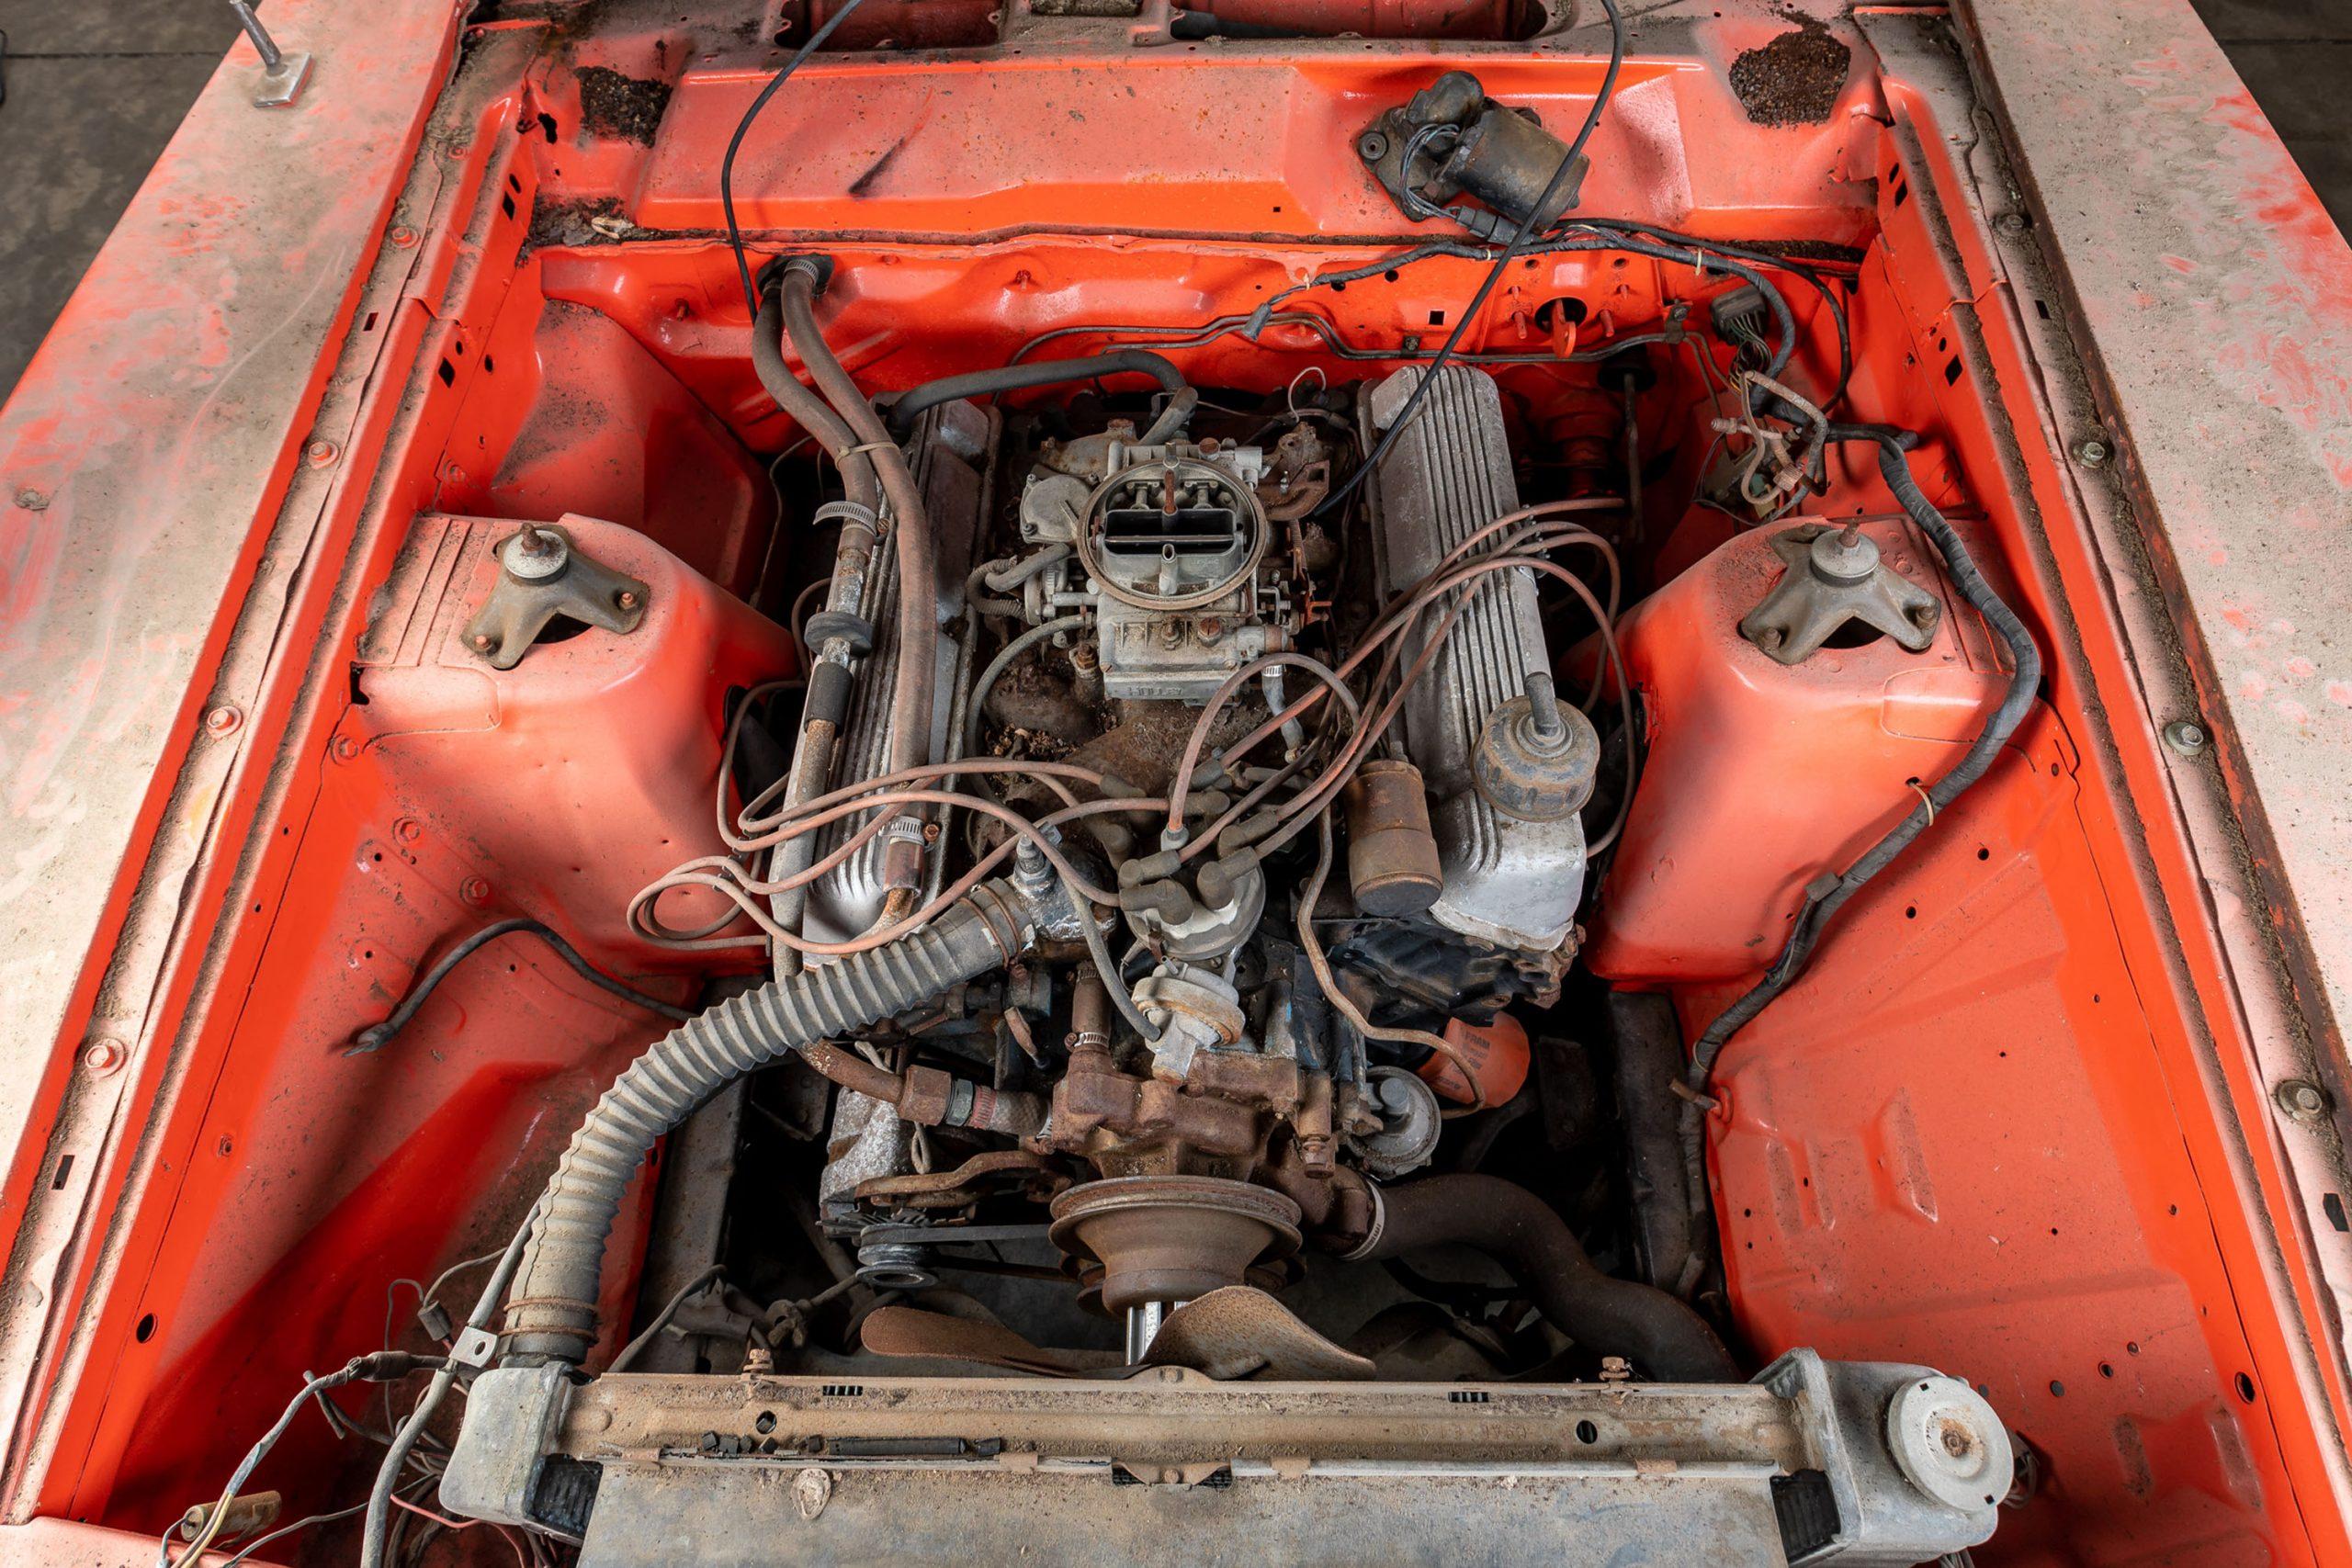 1970 Mercury Cyclone Spoiler Barn Find engine